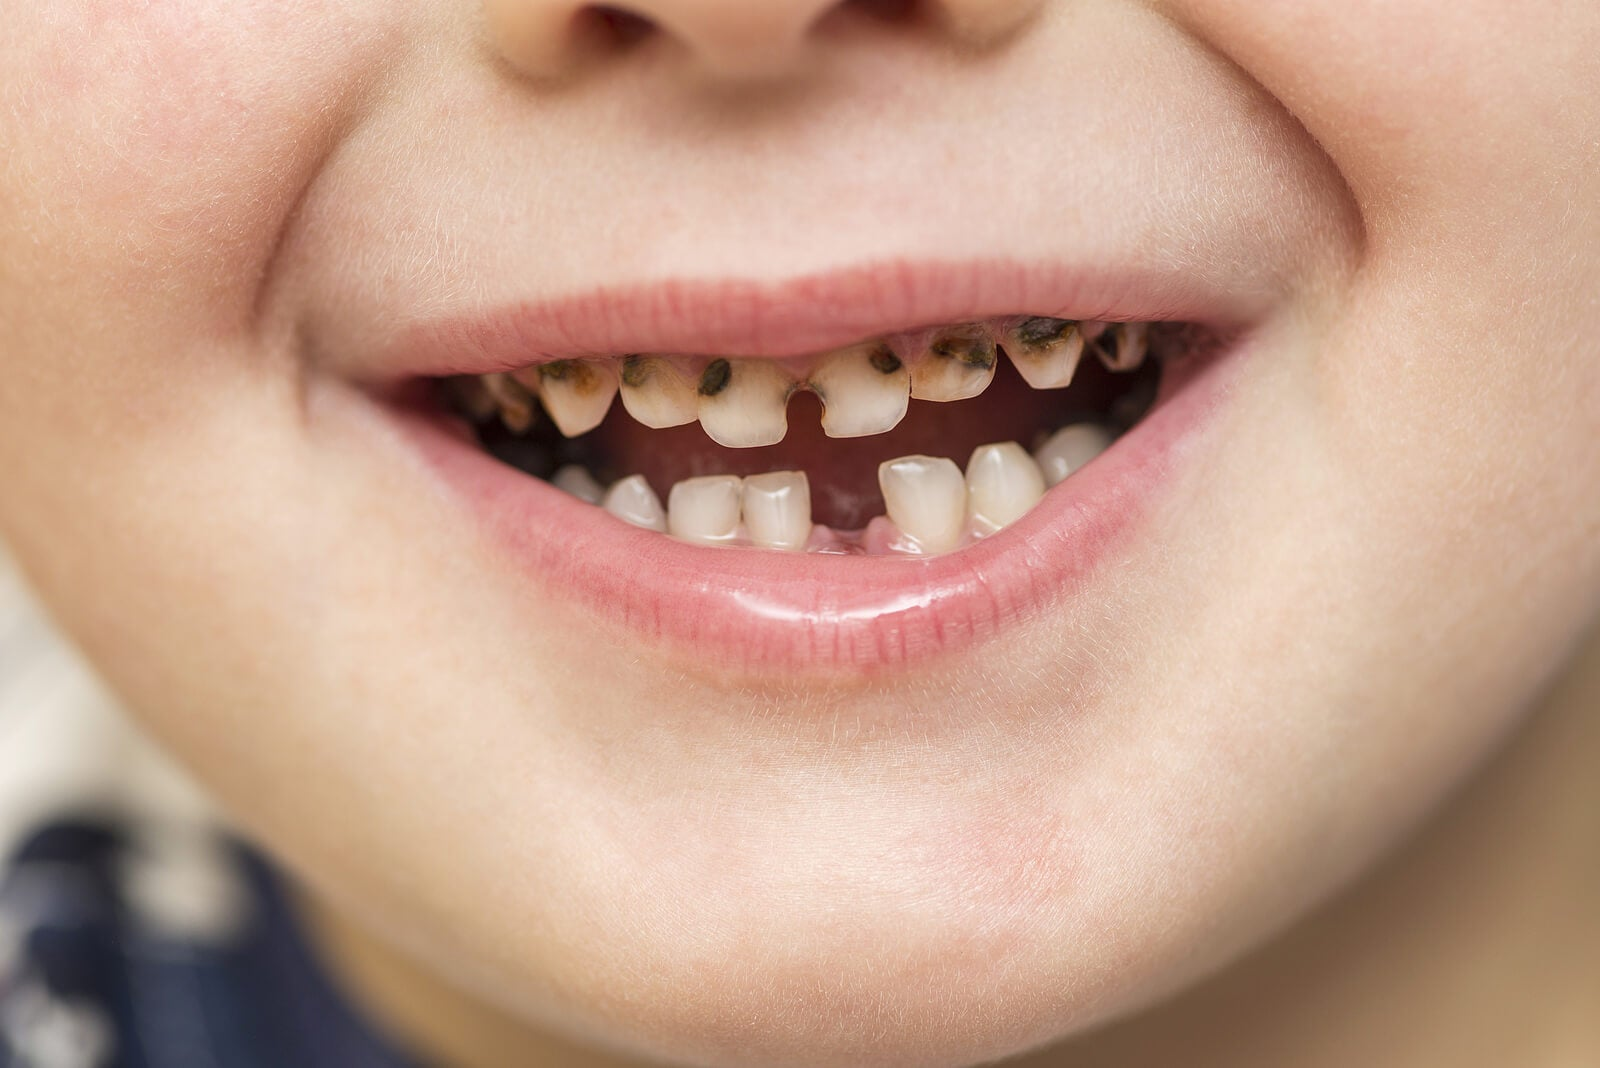 Niño con la boca llena de caries de la infancia temprana.